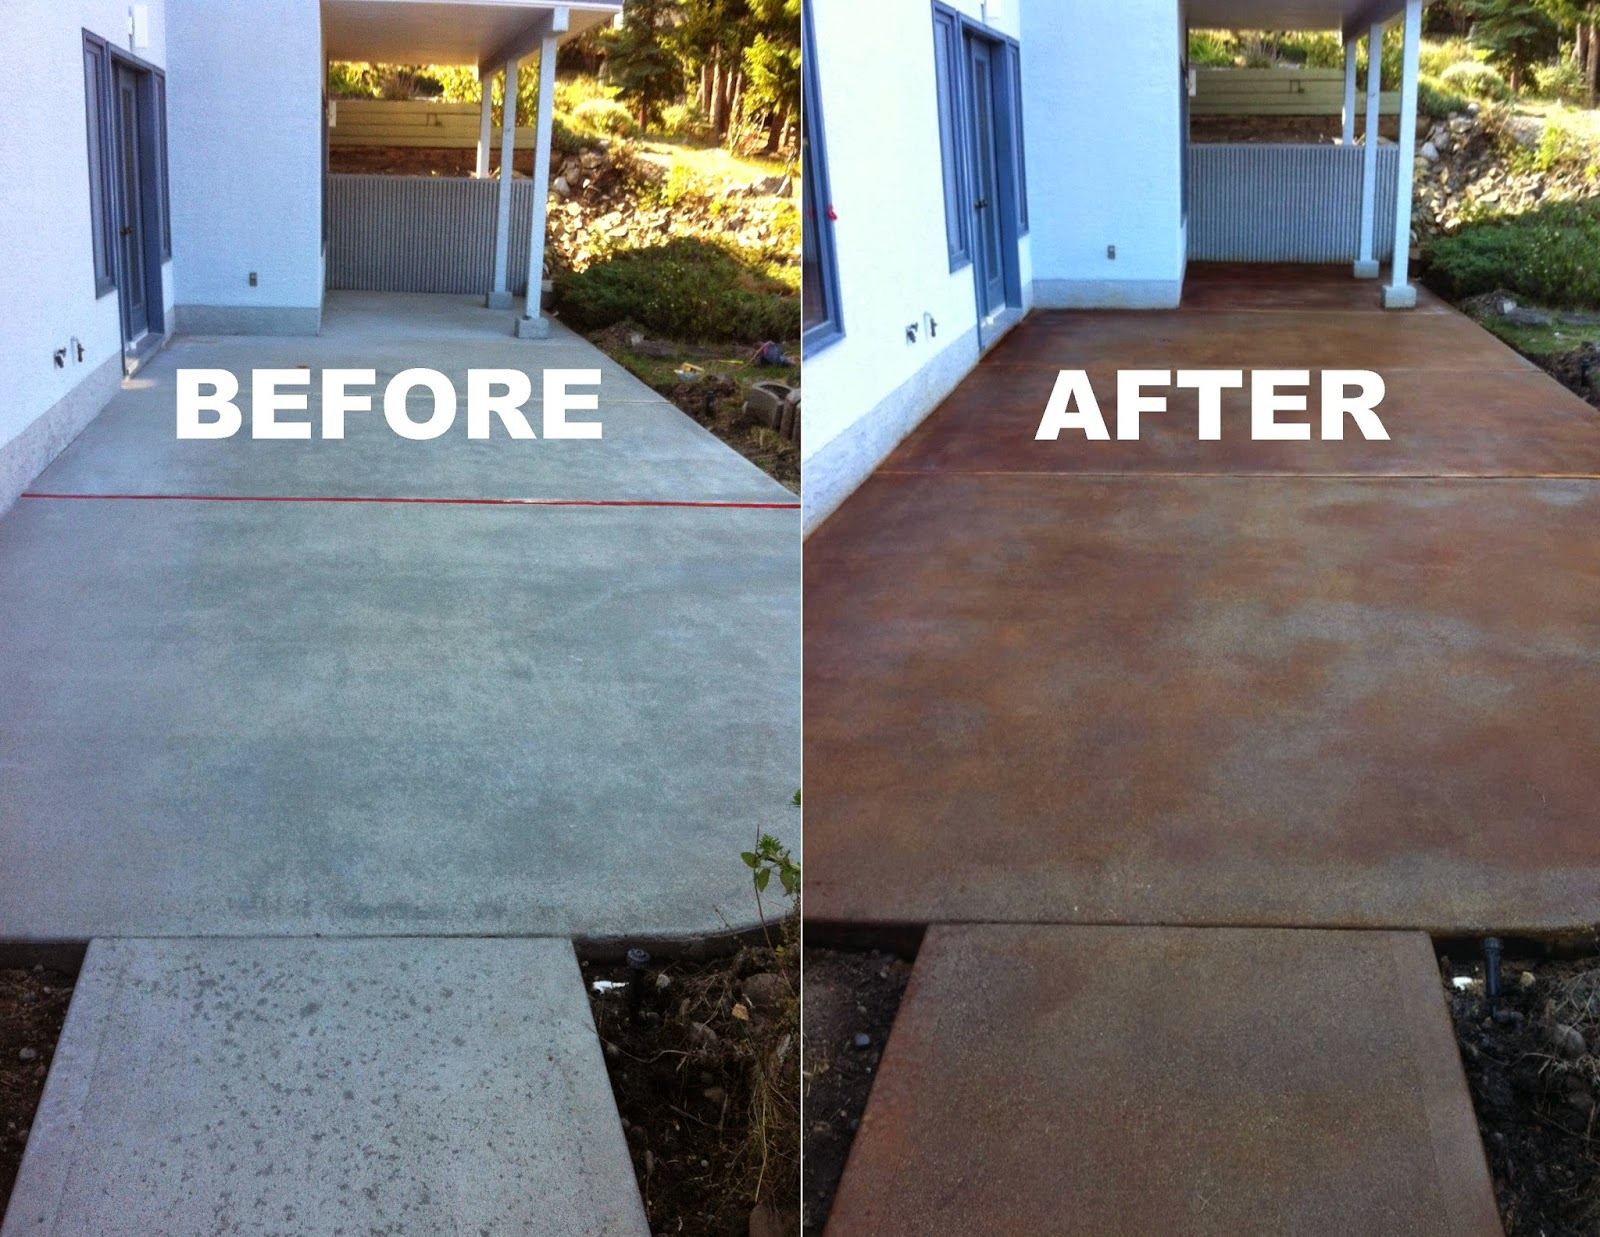 mode concrete: concrete maintenance, repair, acid-staining - pool